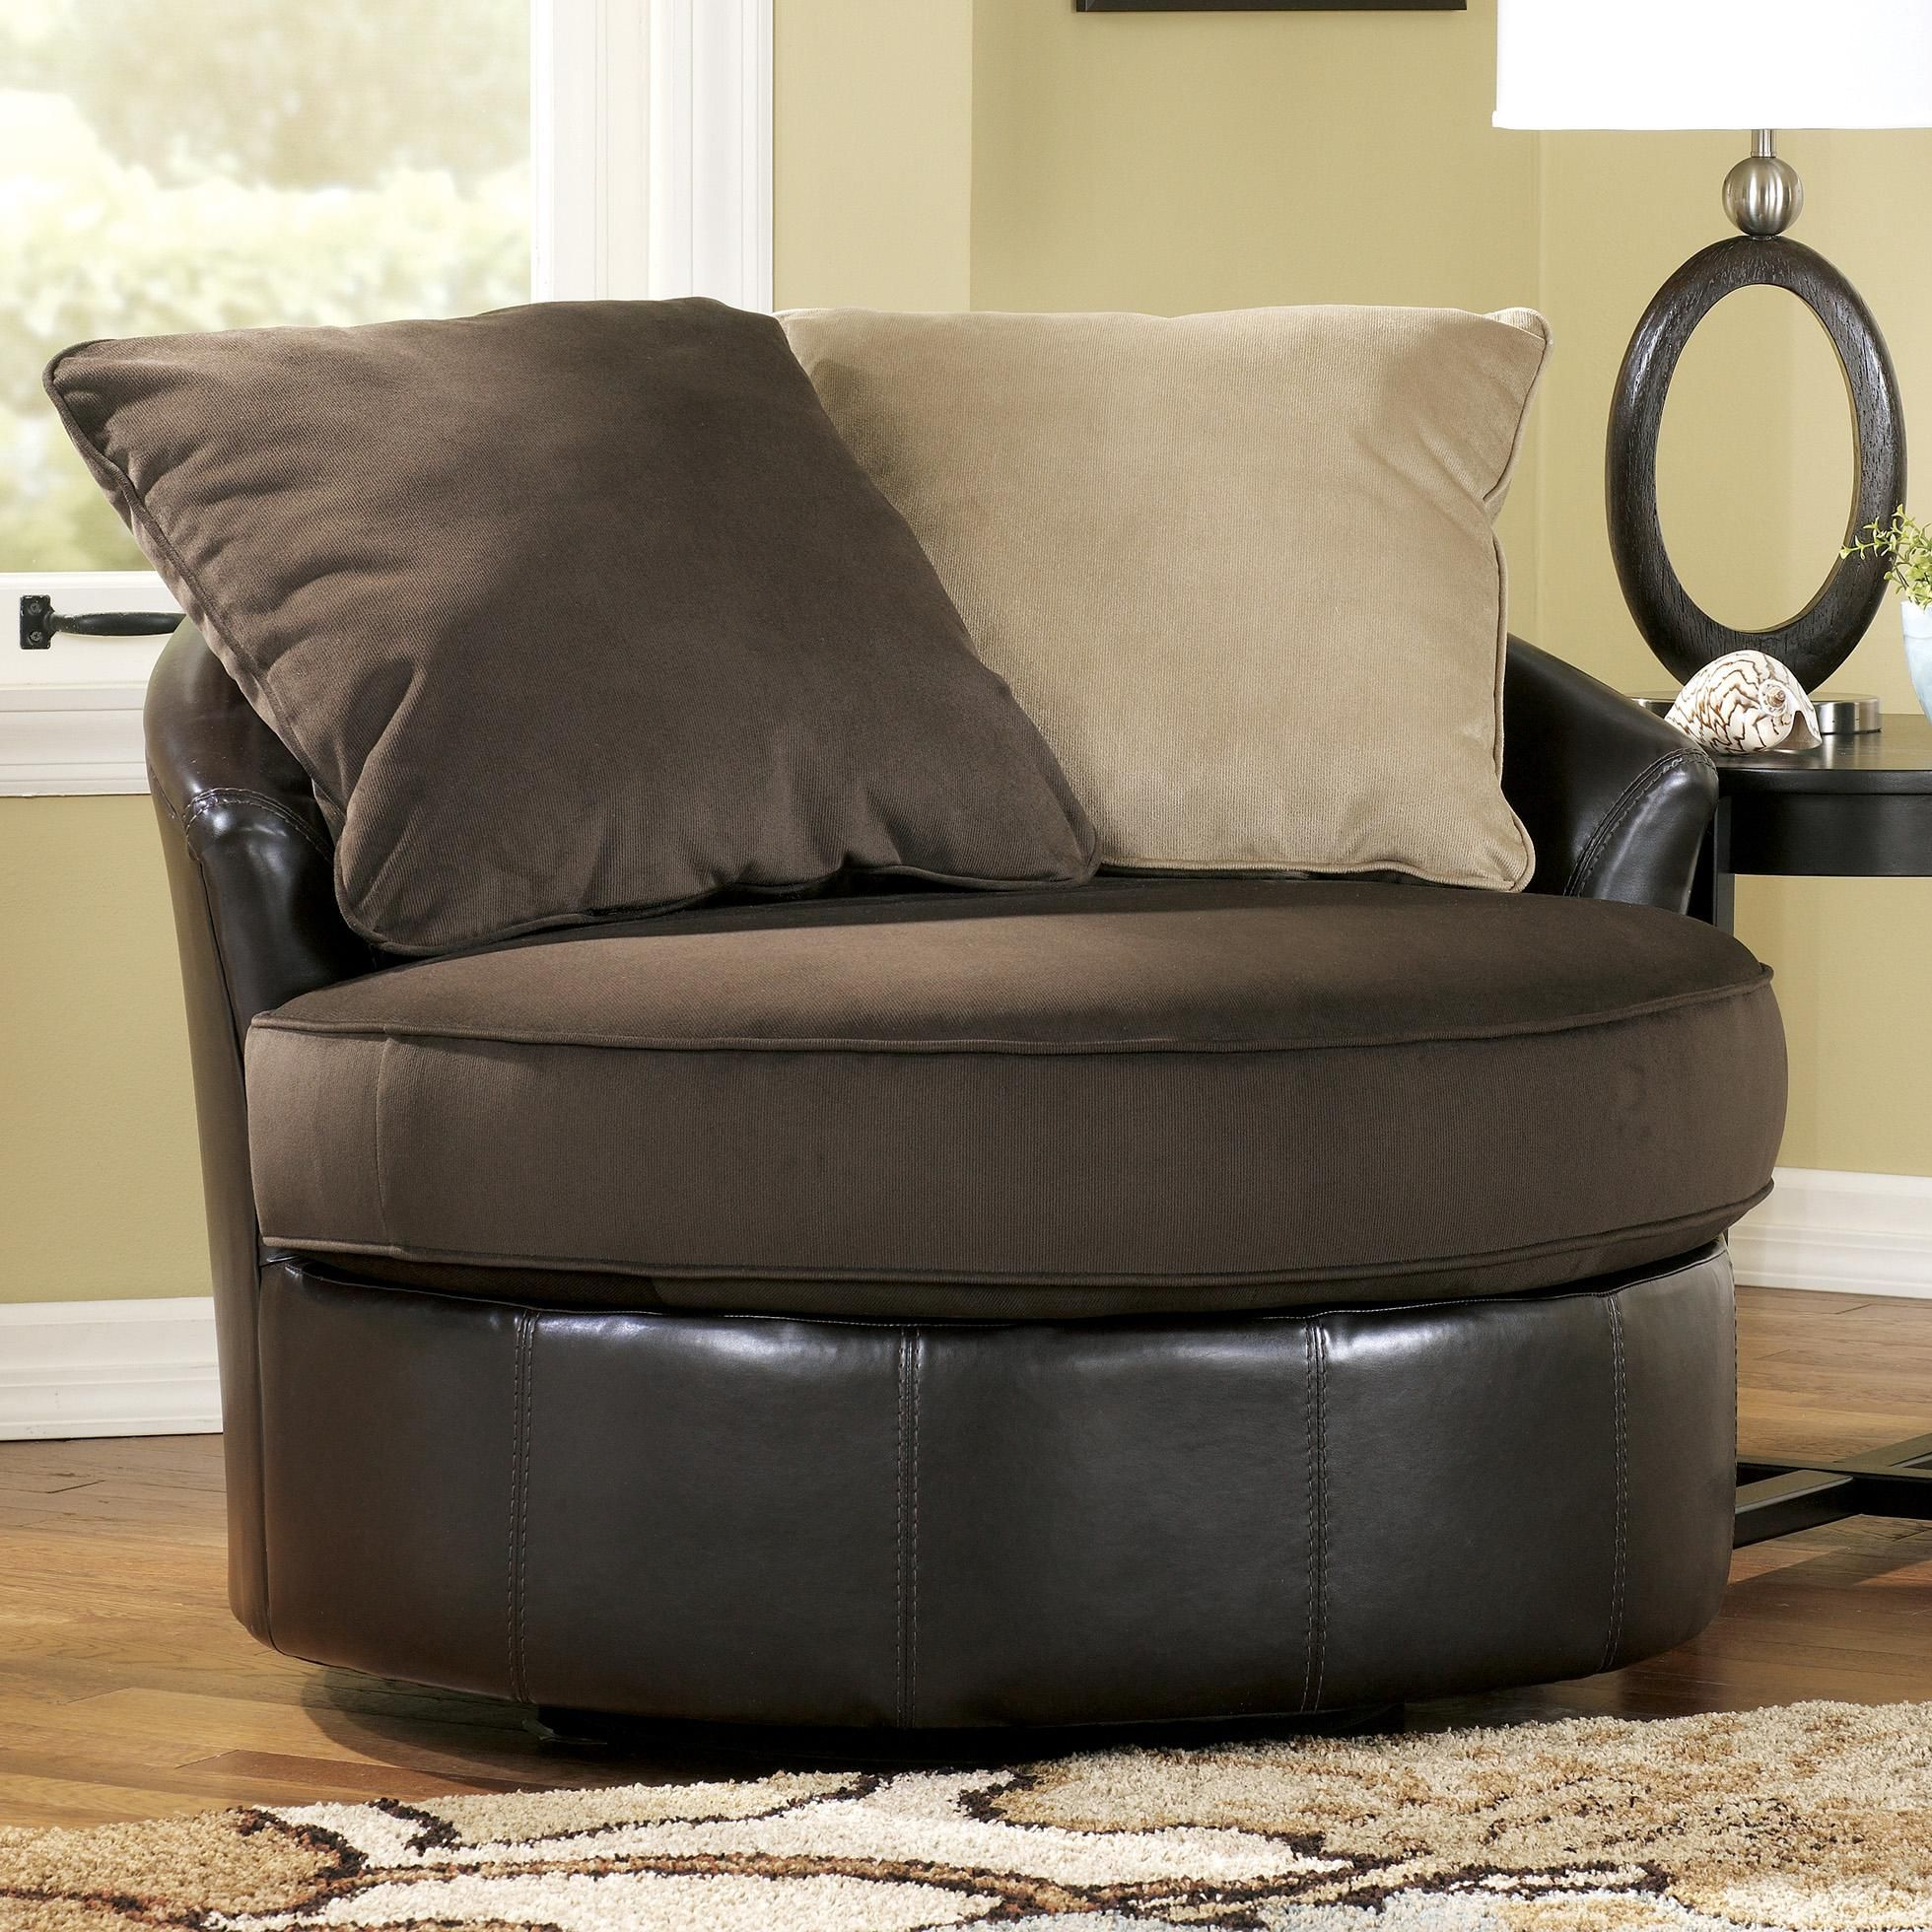 Round Swivel Chair Living Room Gemini Chocolate Round Swivel Chair By Ashley Furniture Living